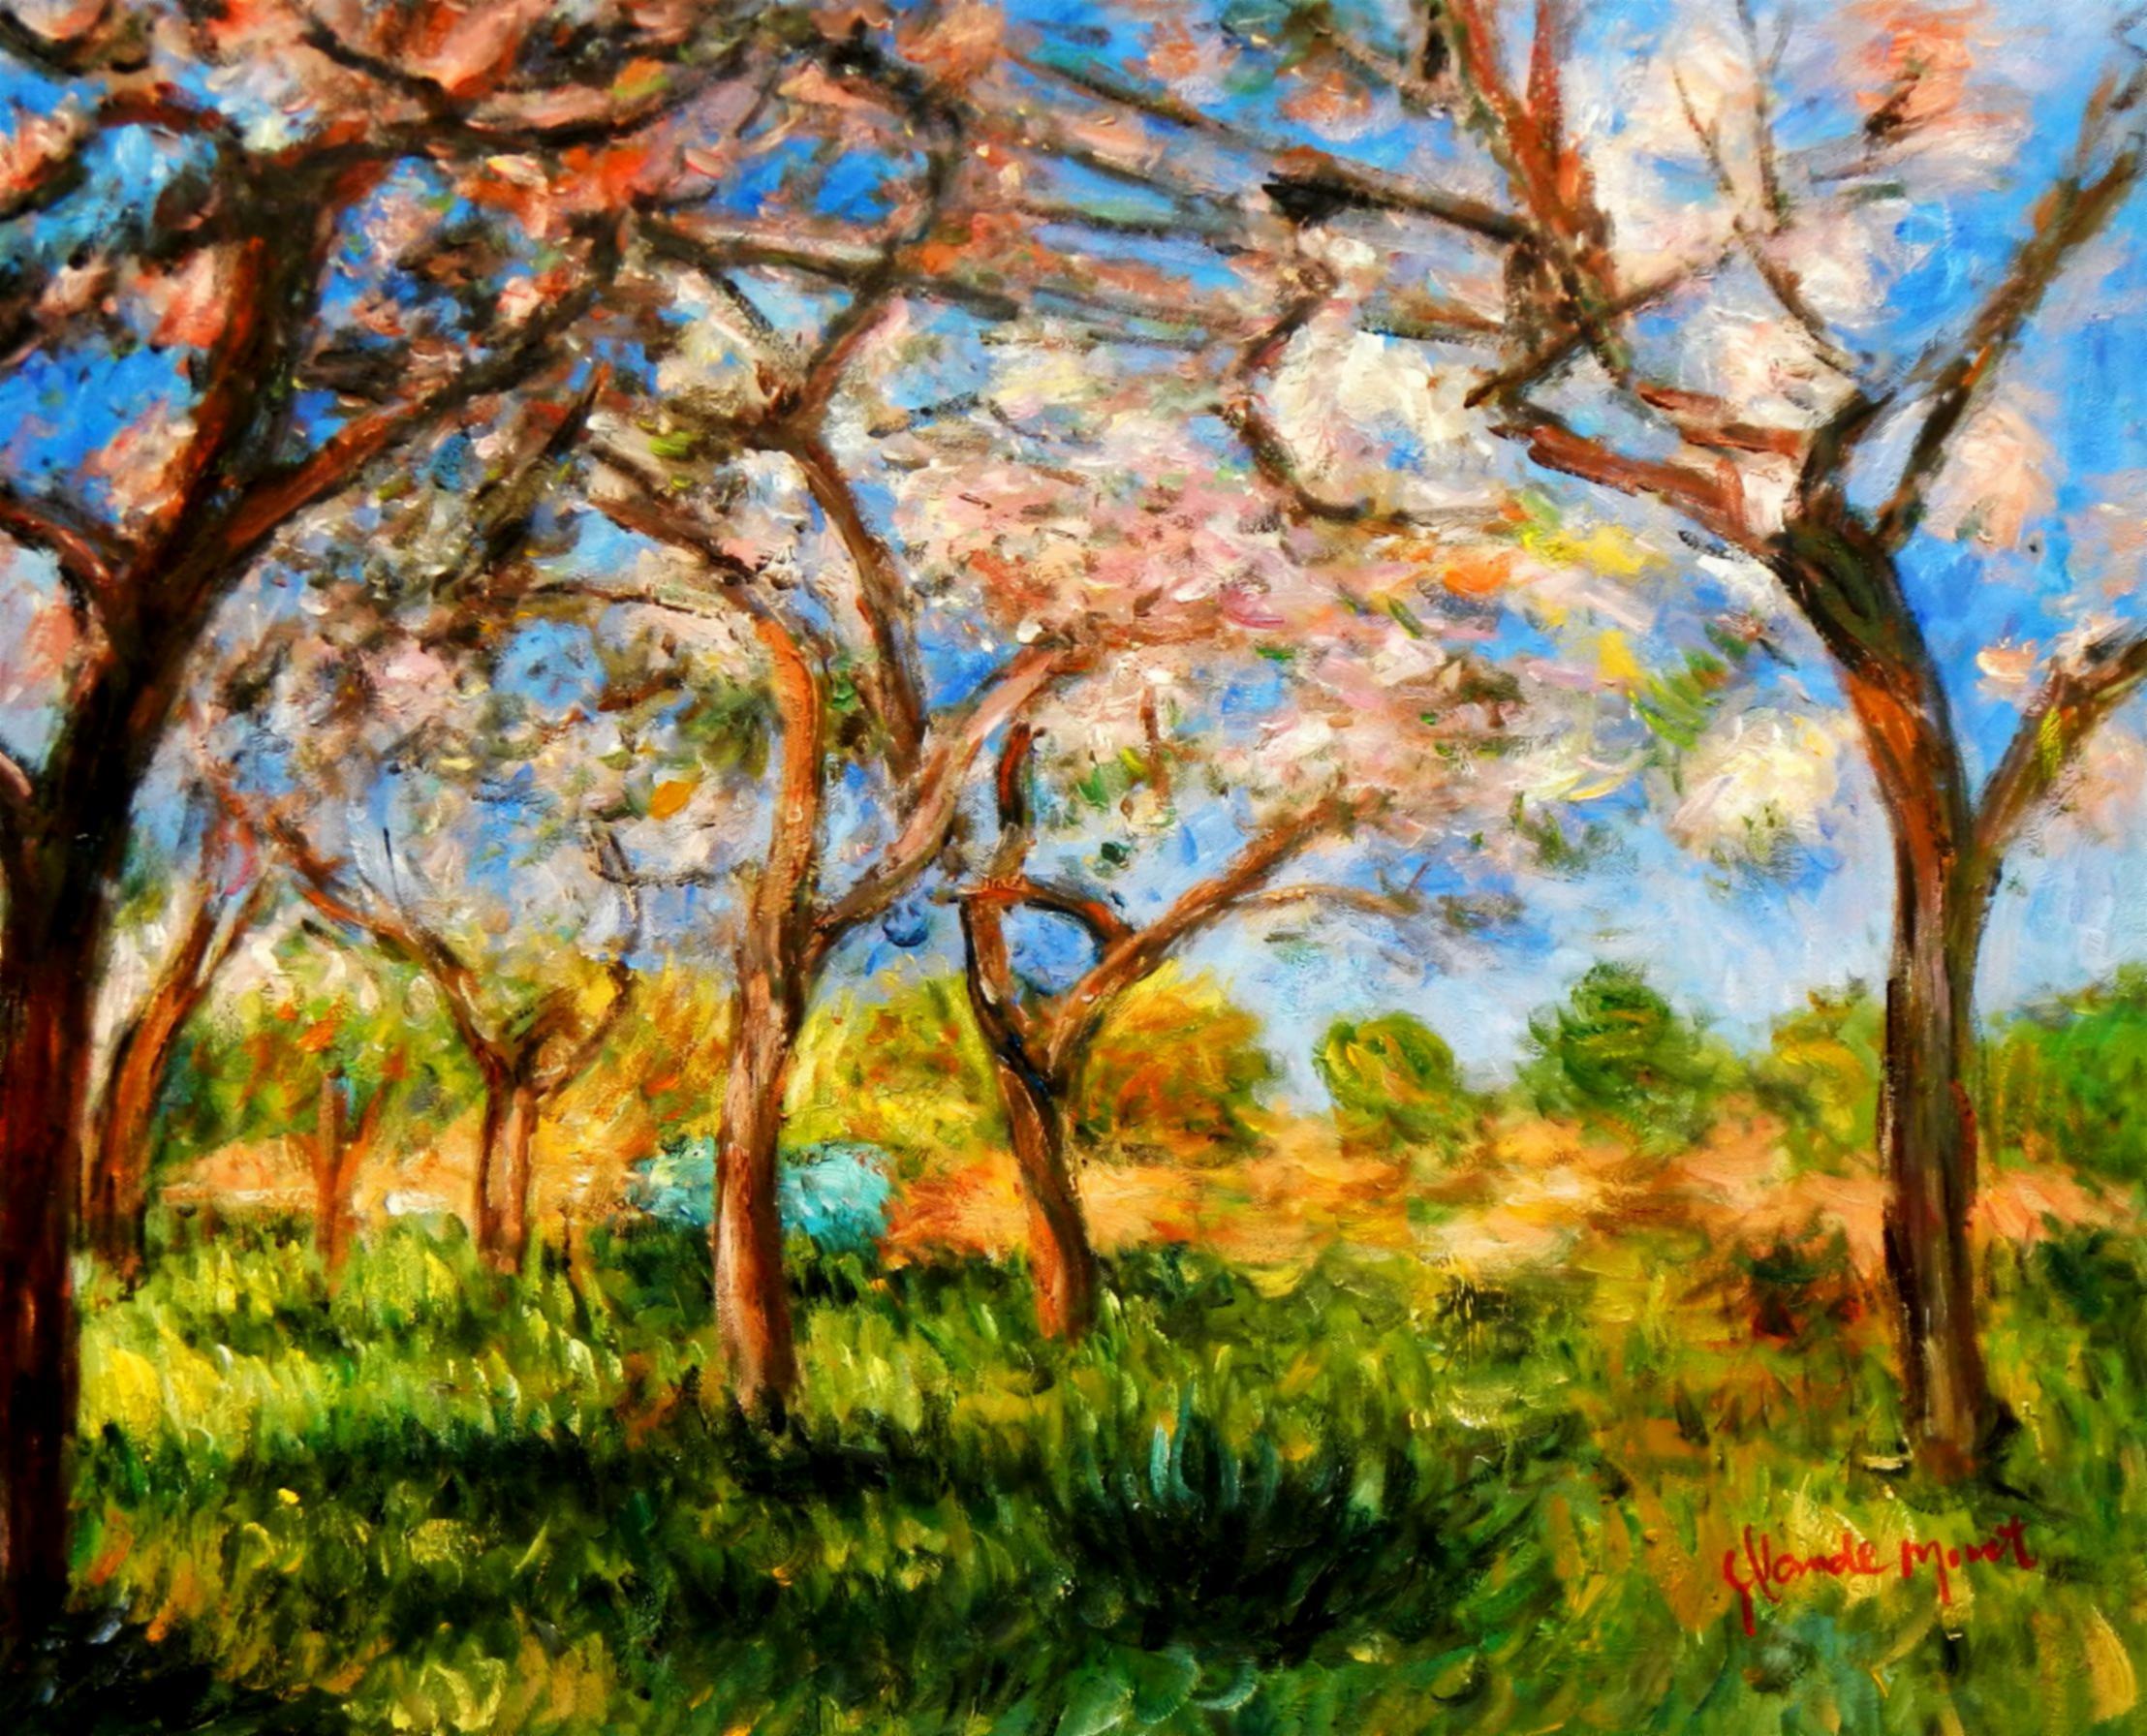 Claude Monet - Frühling in Giverny c94567 50x60cm exzellentes Ölgemälde